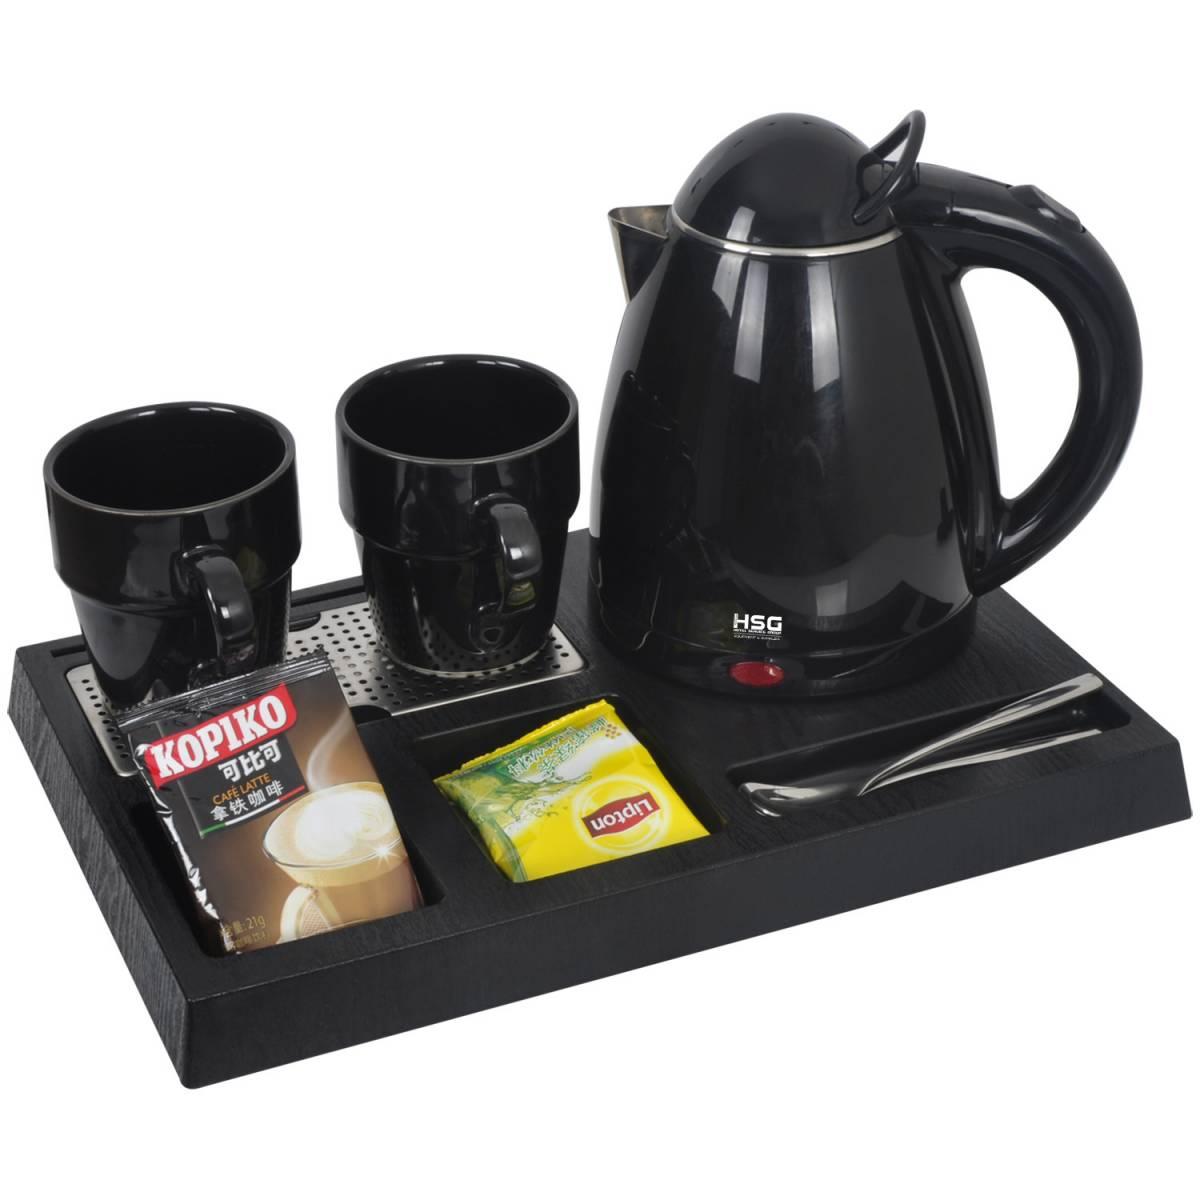 Чайная станция, набор I-H0880S Black (0.8 л) для гостиниц I-H0880S HSG